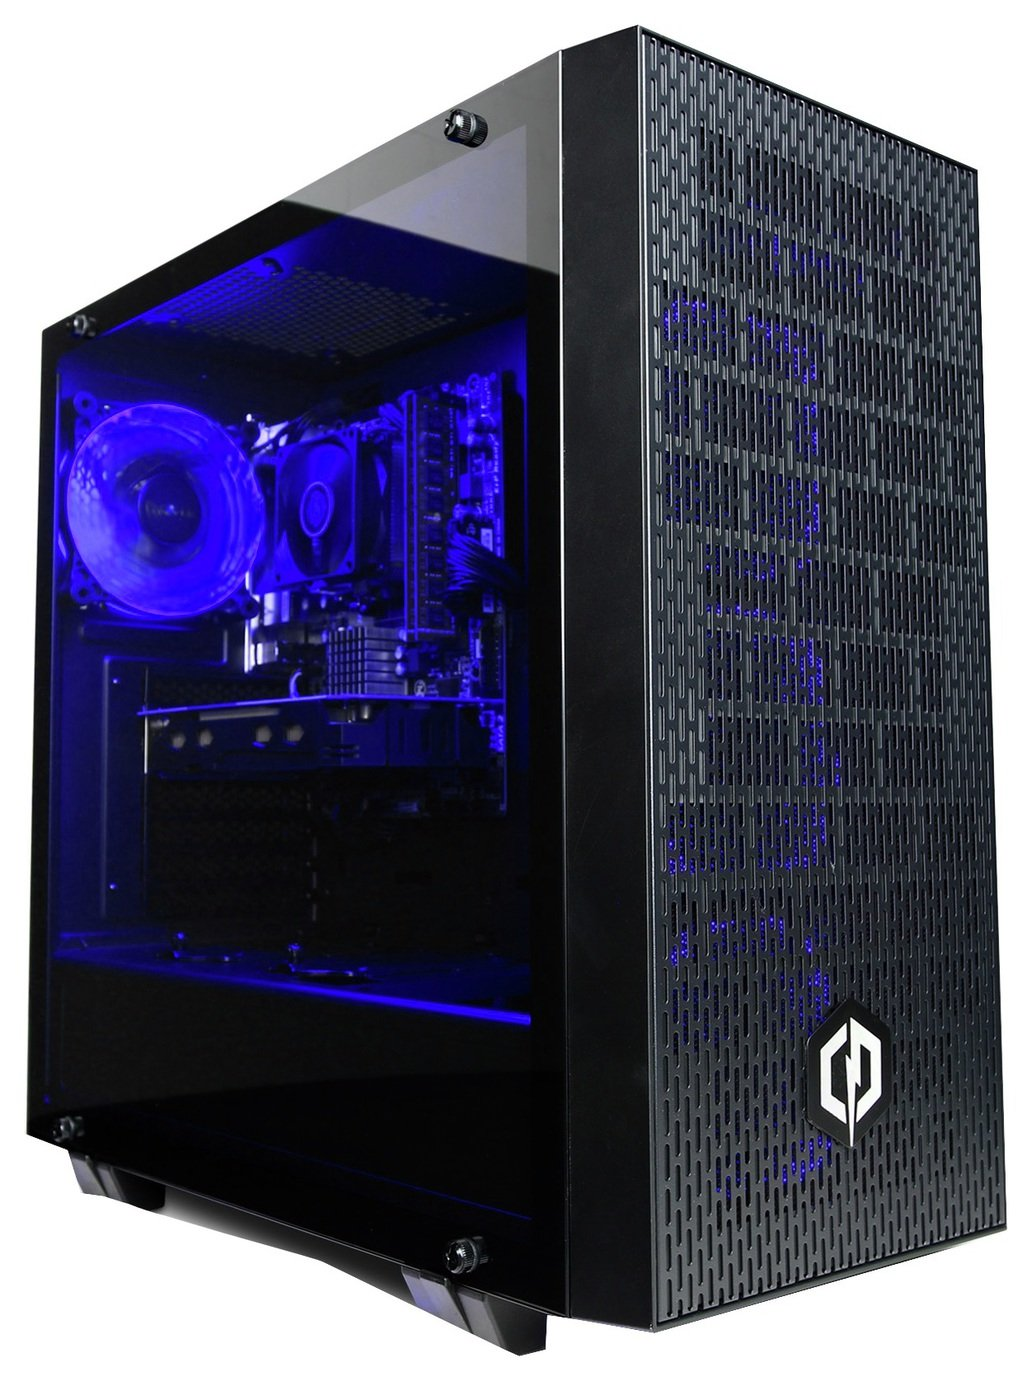 Cyberpower PC Cyberpower PC Aries i5 8GB 2TB GTX1050Ti Gaming PC